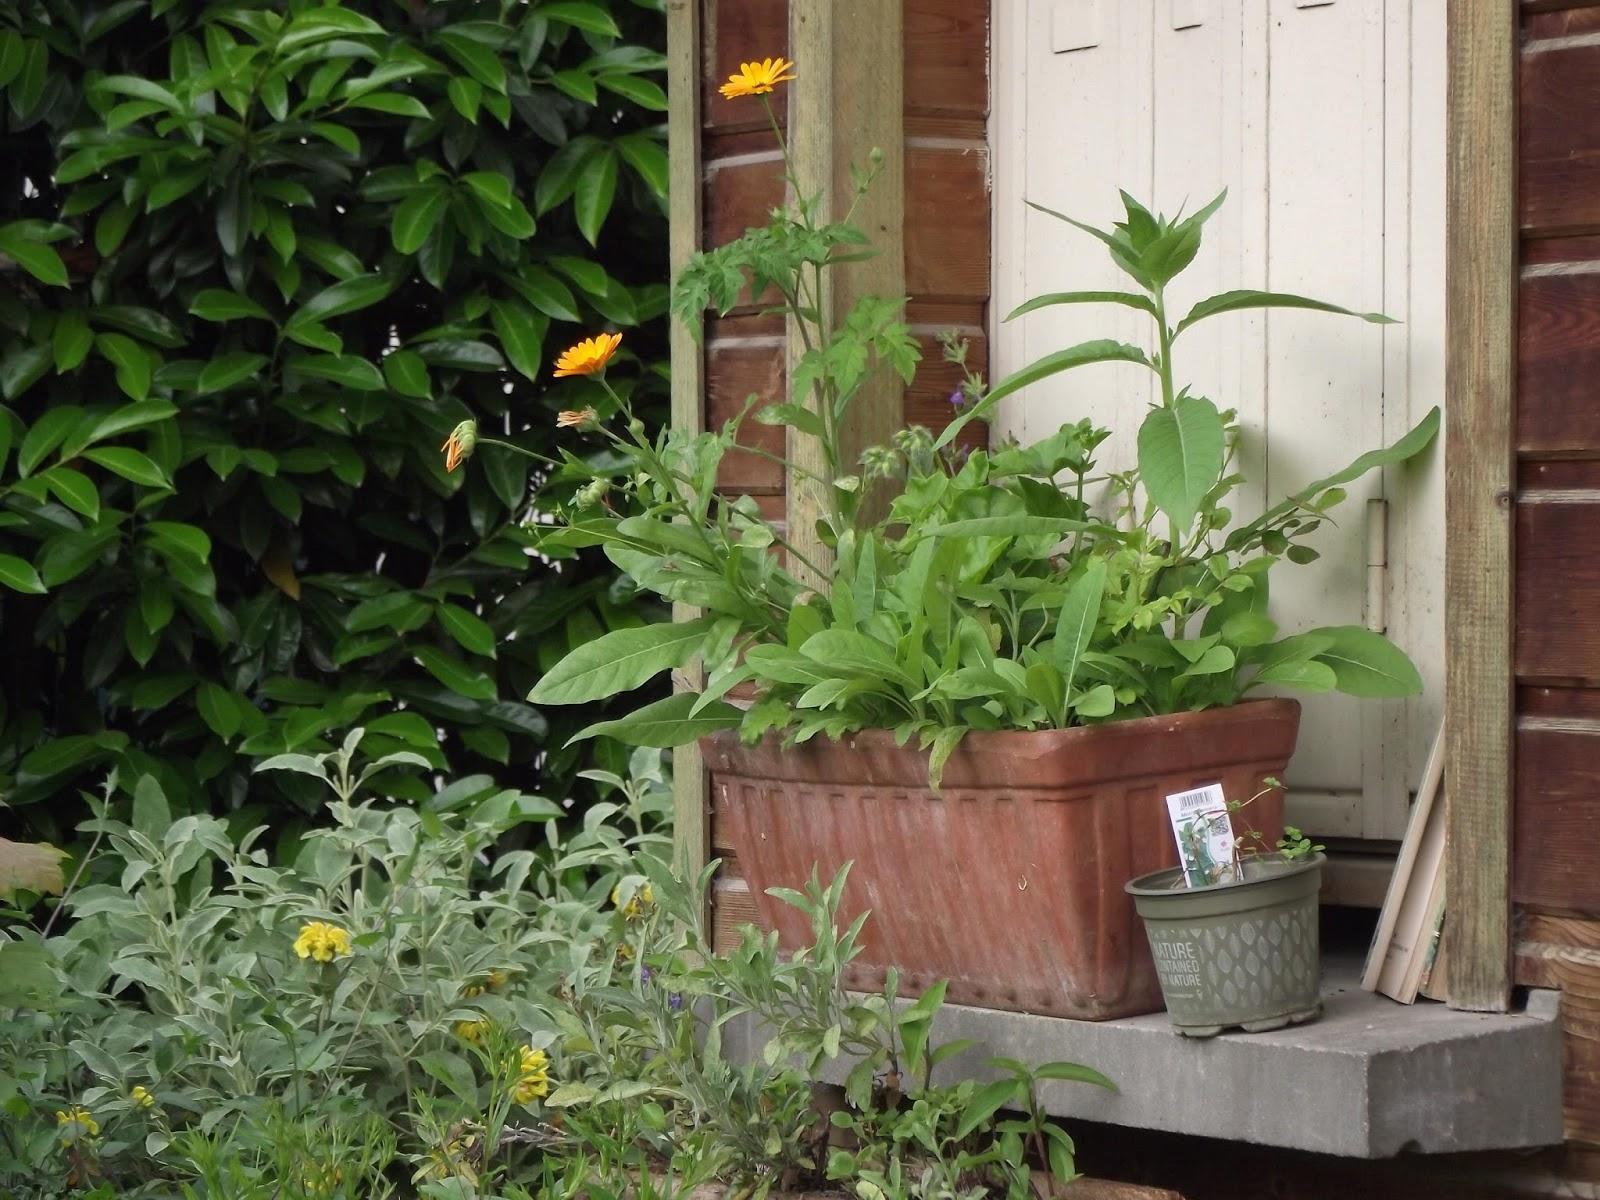 Le jardin villemin un jardin de campagne entre gare et for Jardin villemin